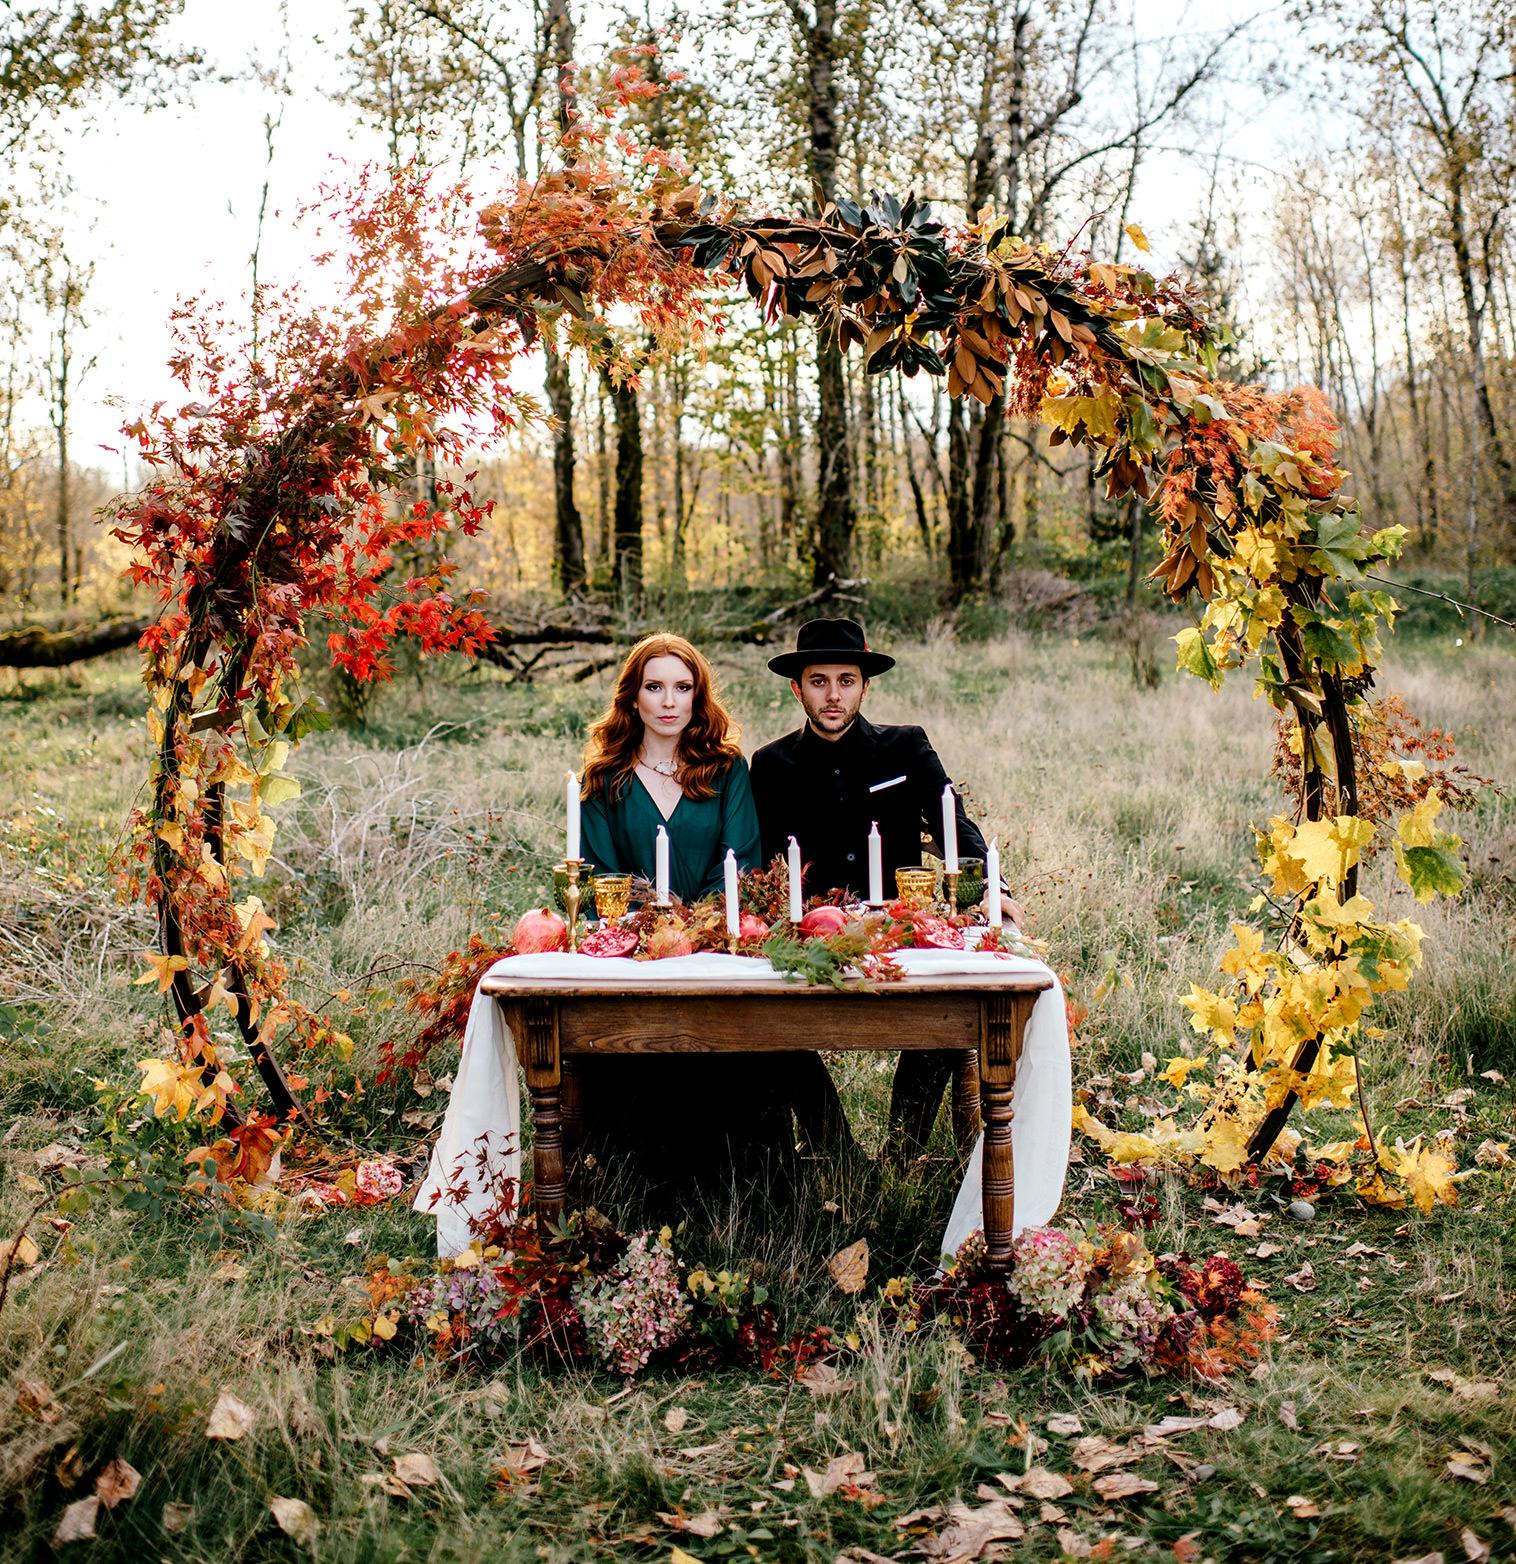 Portland-elopement-photographer-Autunm-wedding-inspiration-29.jpg